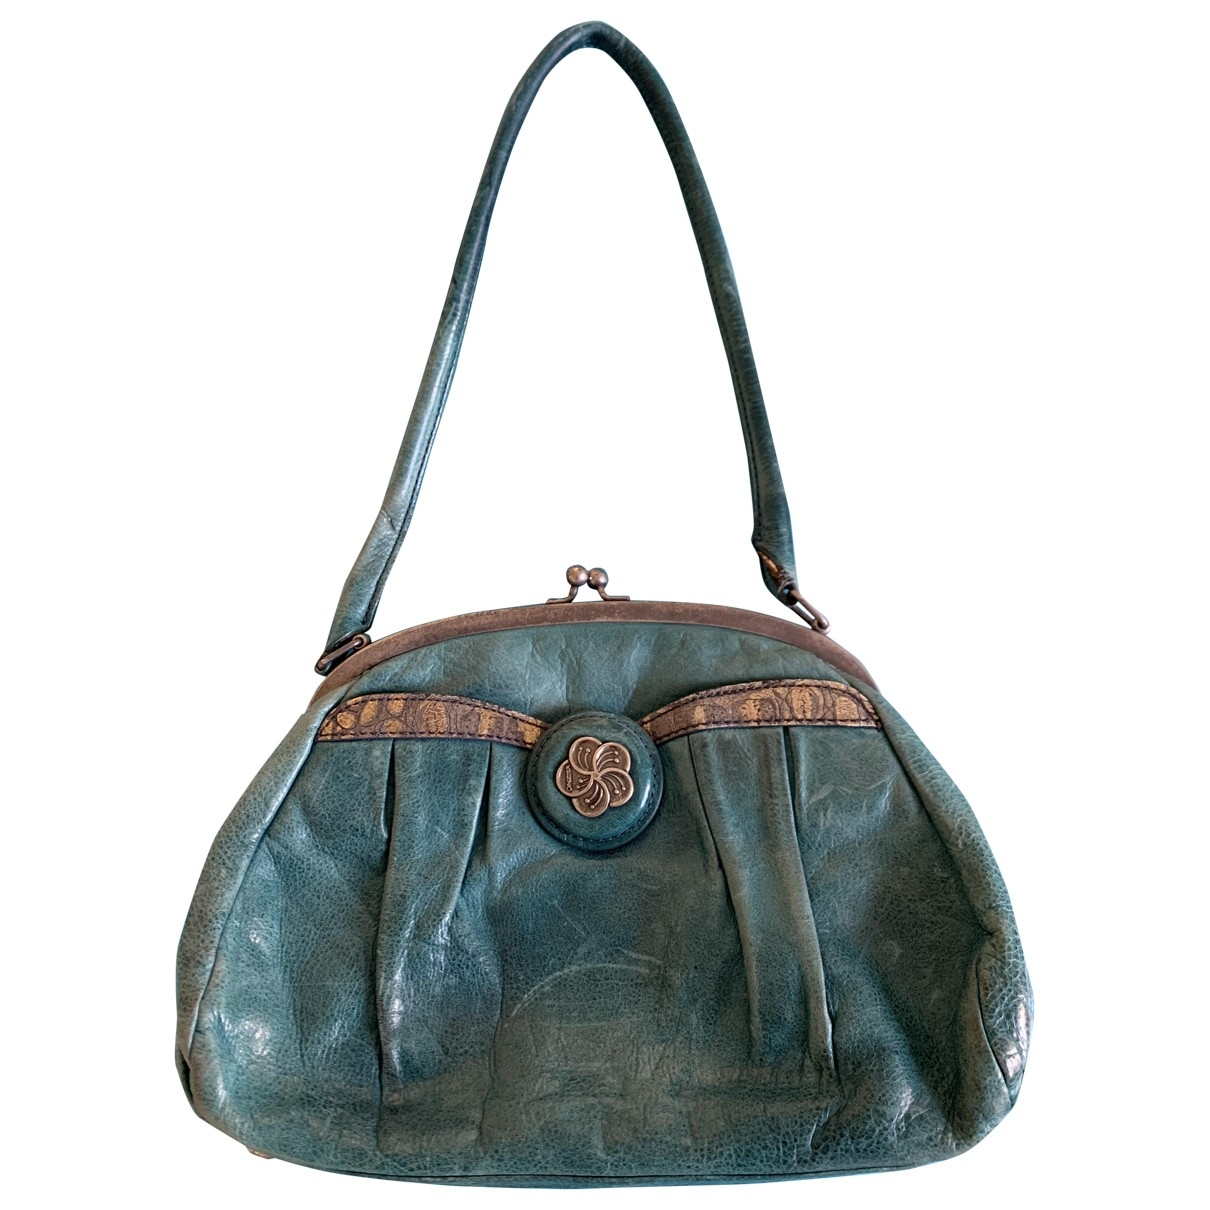 Kenzo \N Handtasche in  Tuerkis Leder